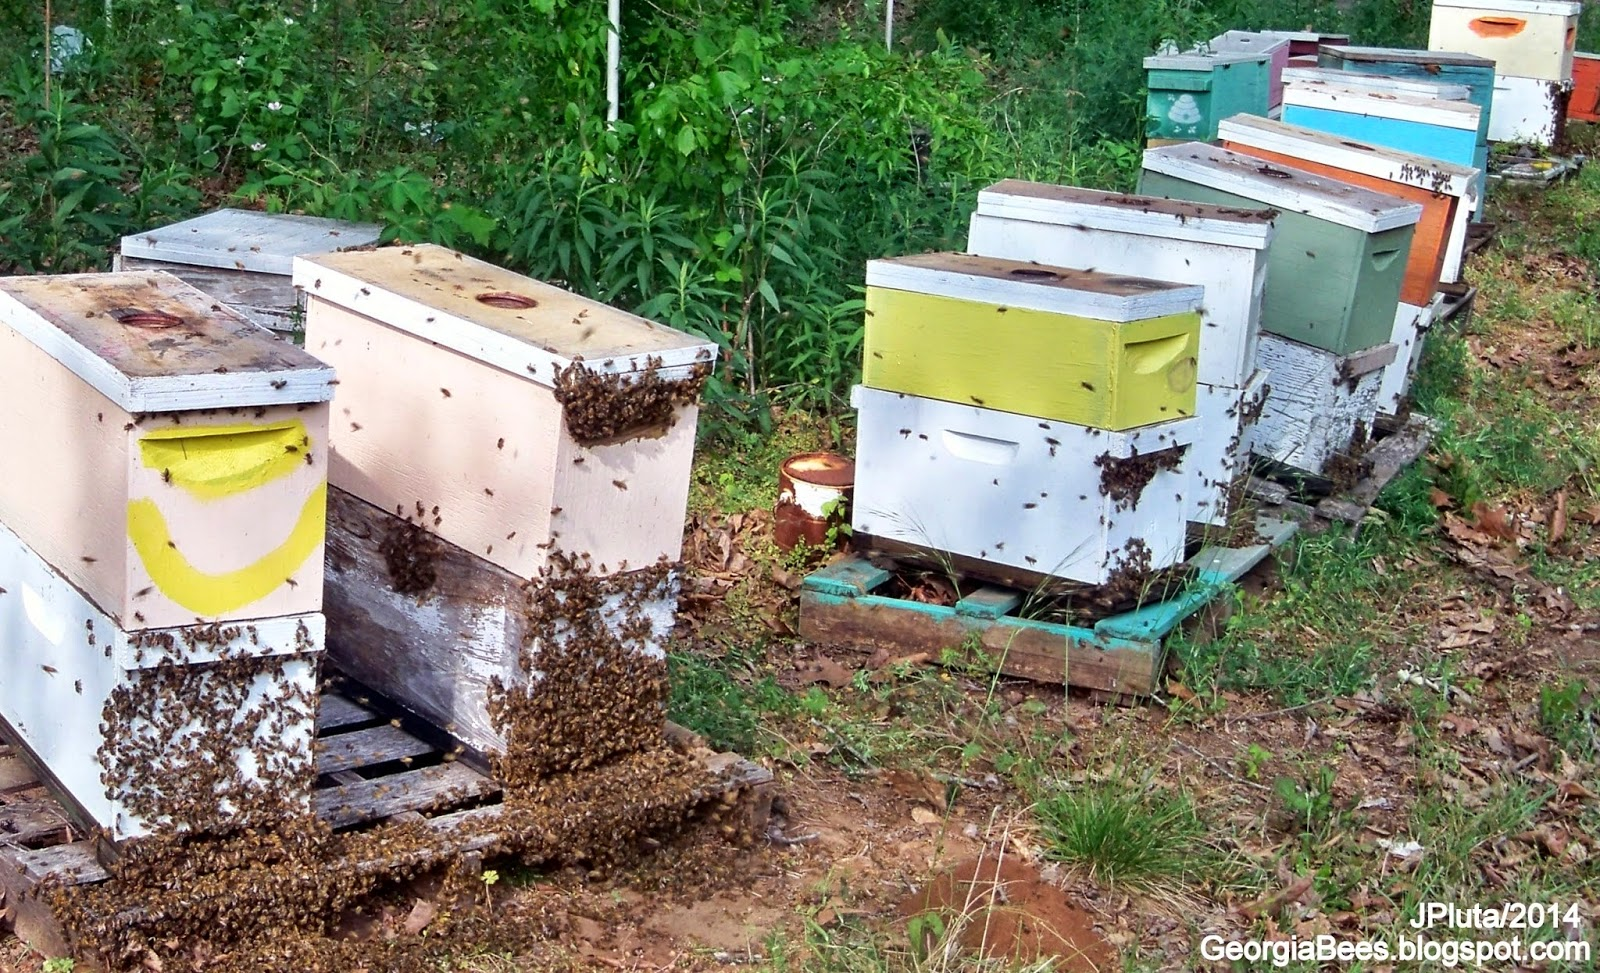 Beekeeping Beekeeper Honey Bees Pollen Wax Candle Propolis